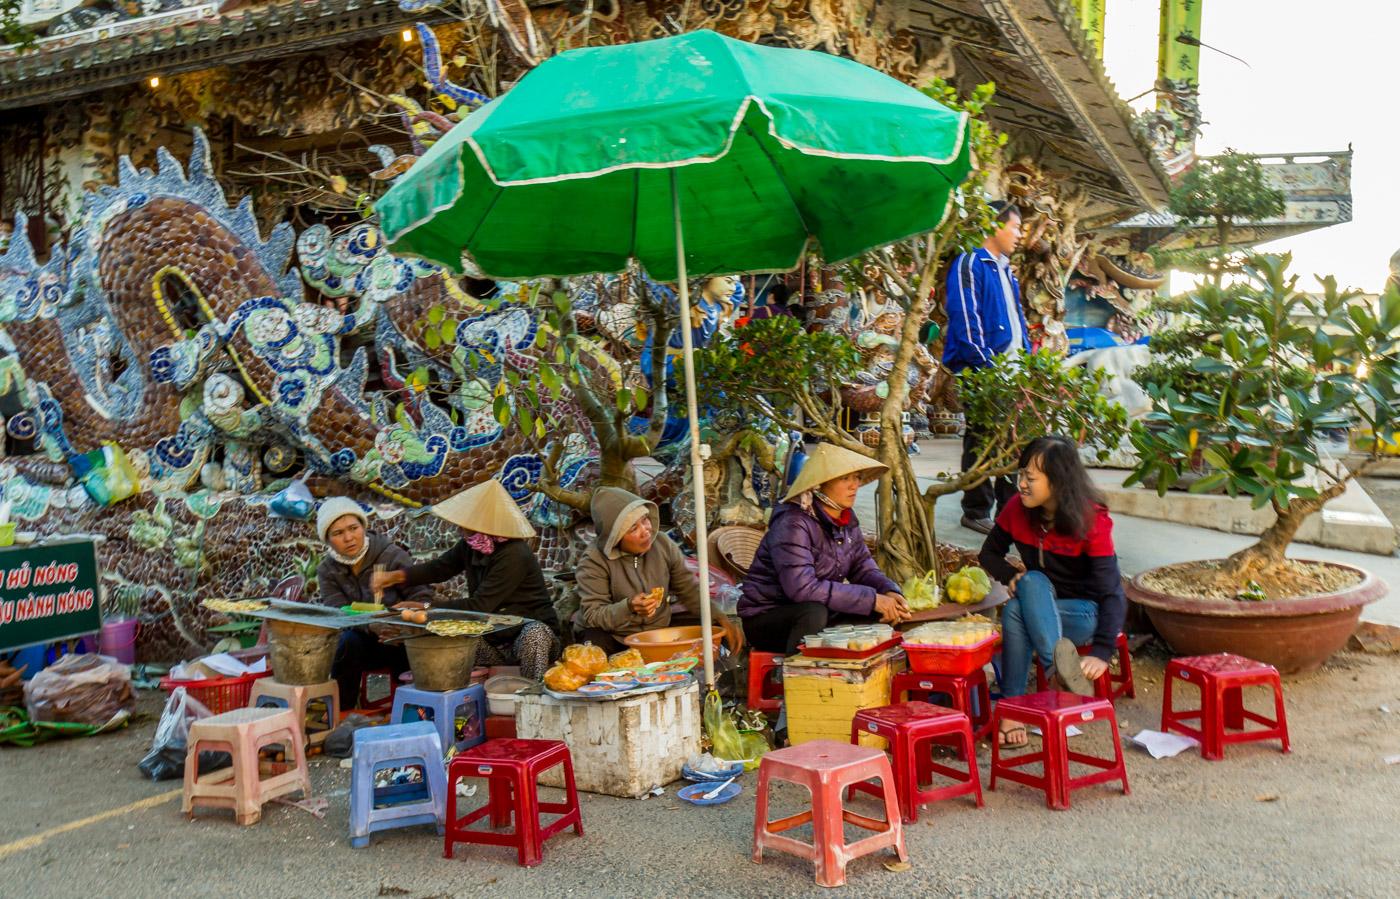 Vendors and dragon.